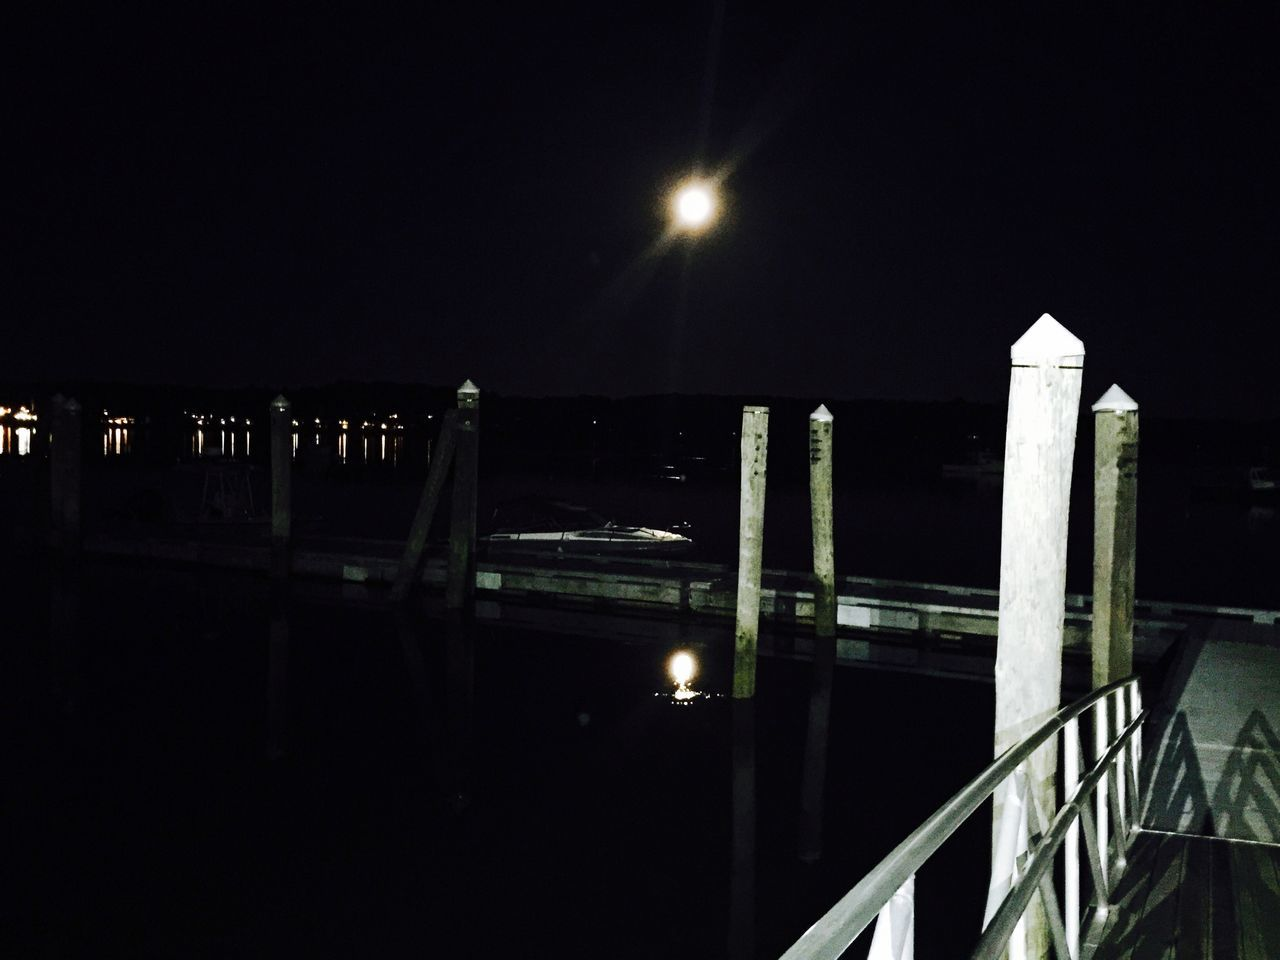 Waterfront Nightphotography Moon Moonlight Taking Photos Maine Carol Sharkey Photography